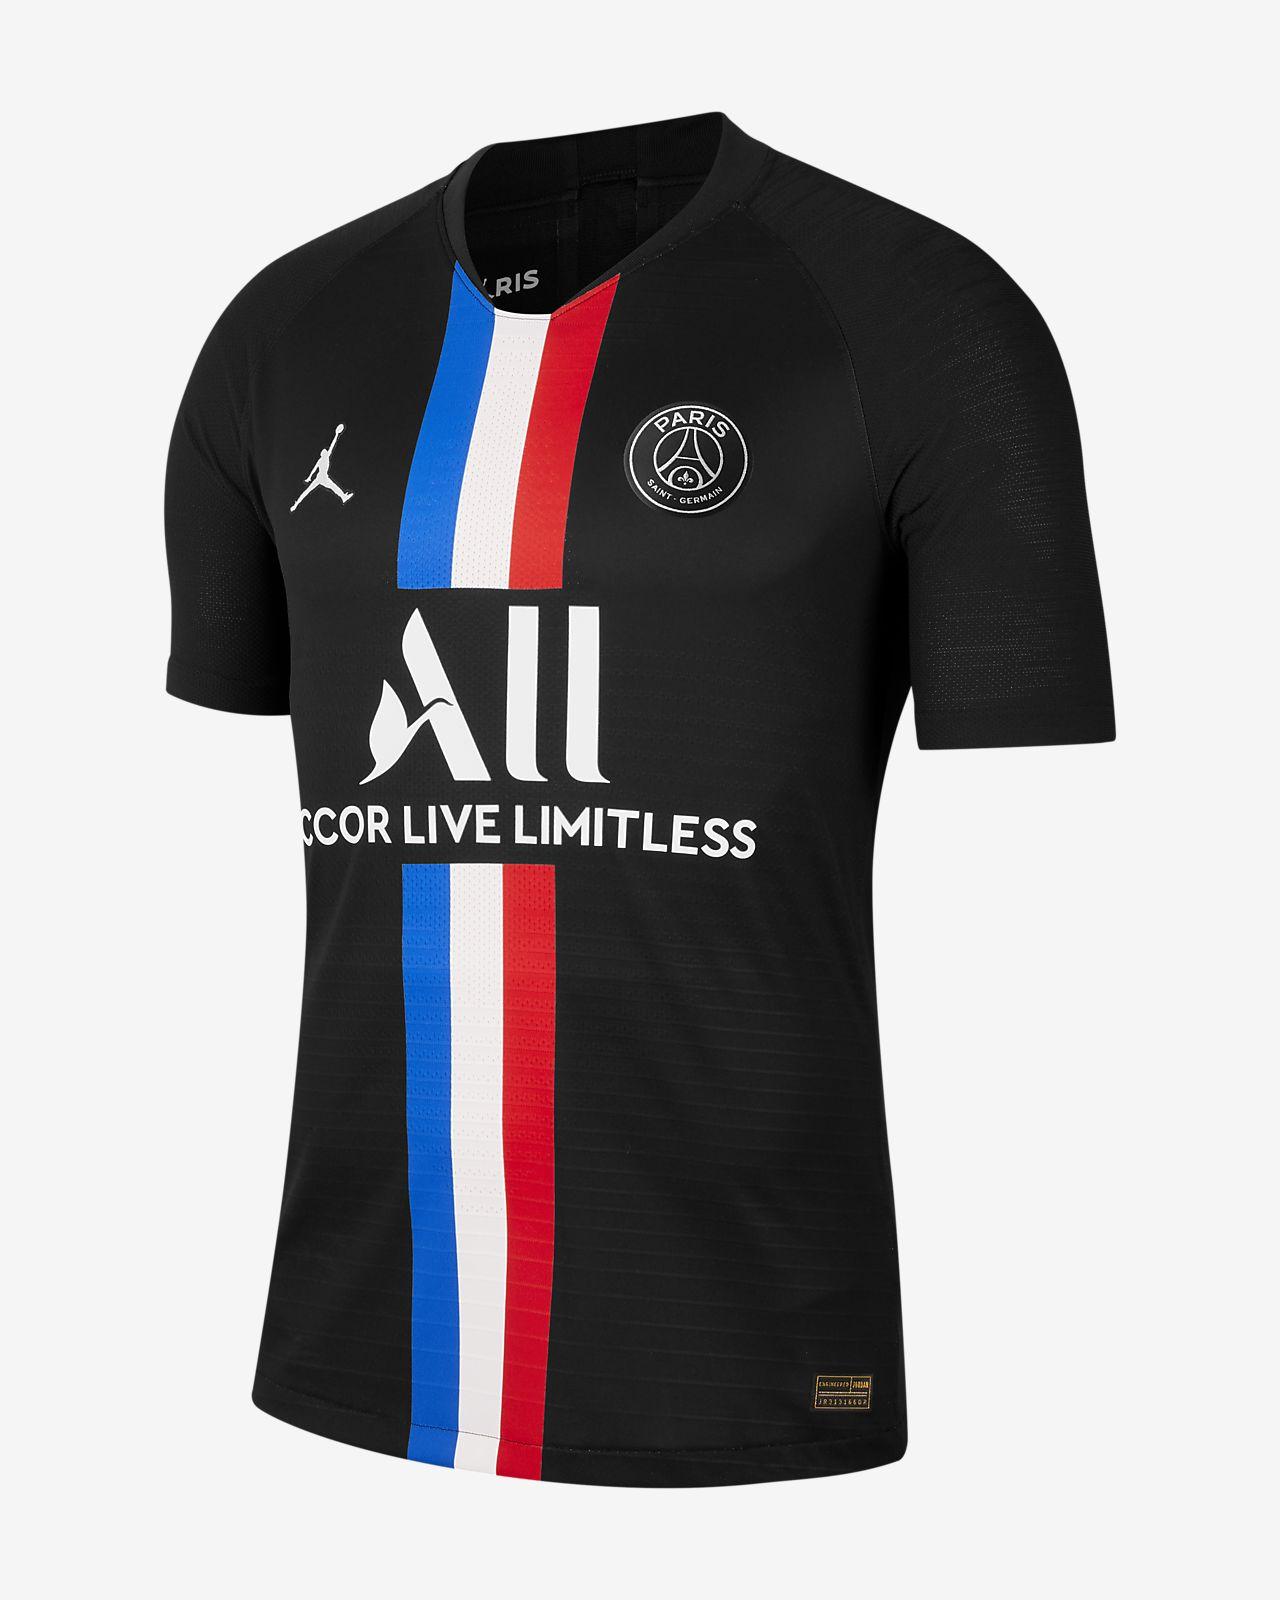 Jordan x Paris Saint-Germain 2019/20 Vapor Match Fourth Voetbalshirt voor heren